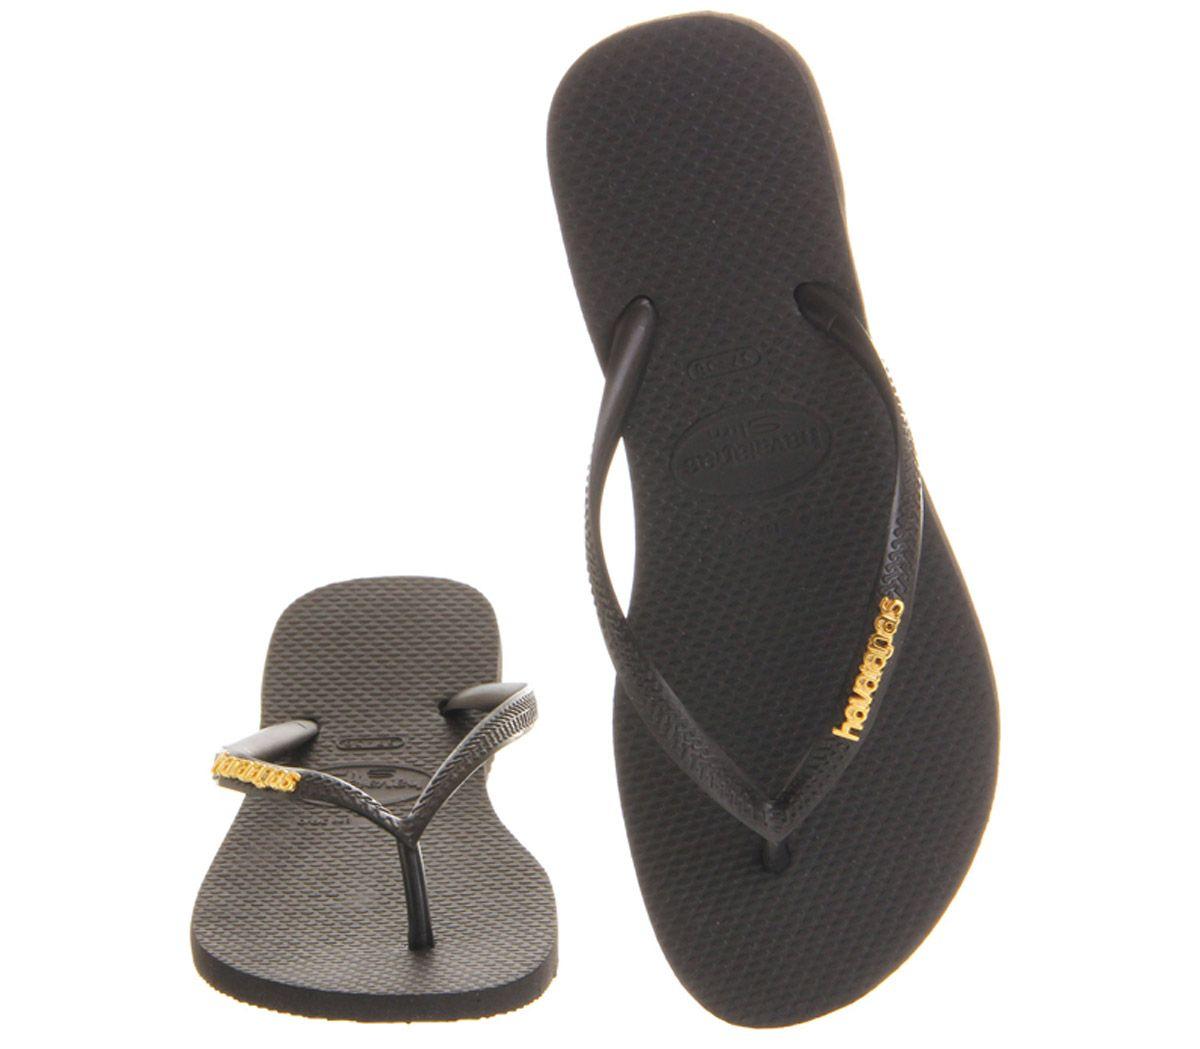 083c7cfdad44 Womens Havaianas Slim Logo Metallic Exclusive Black Gold Sandals